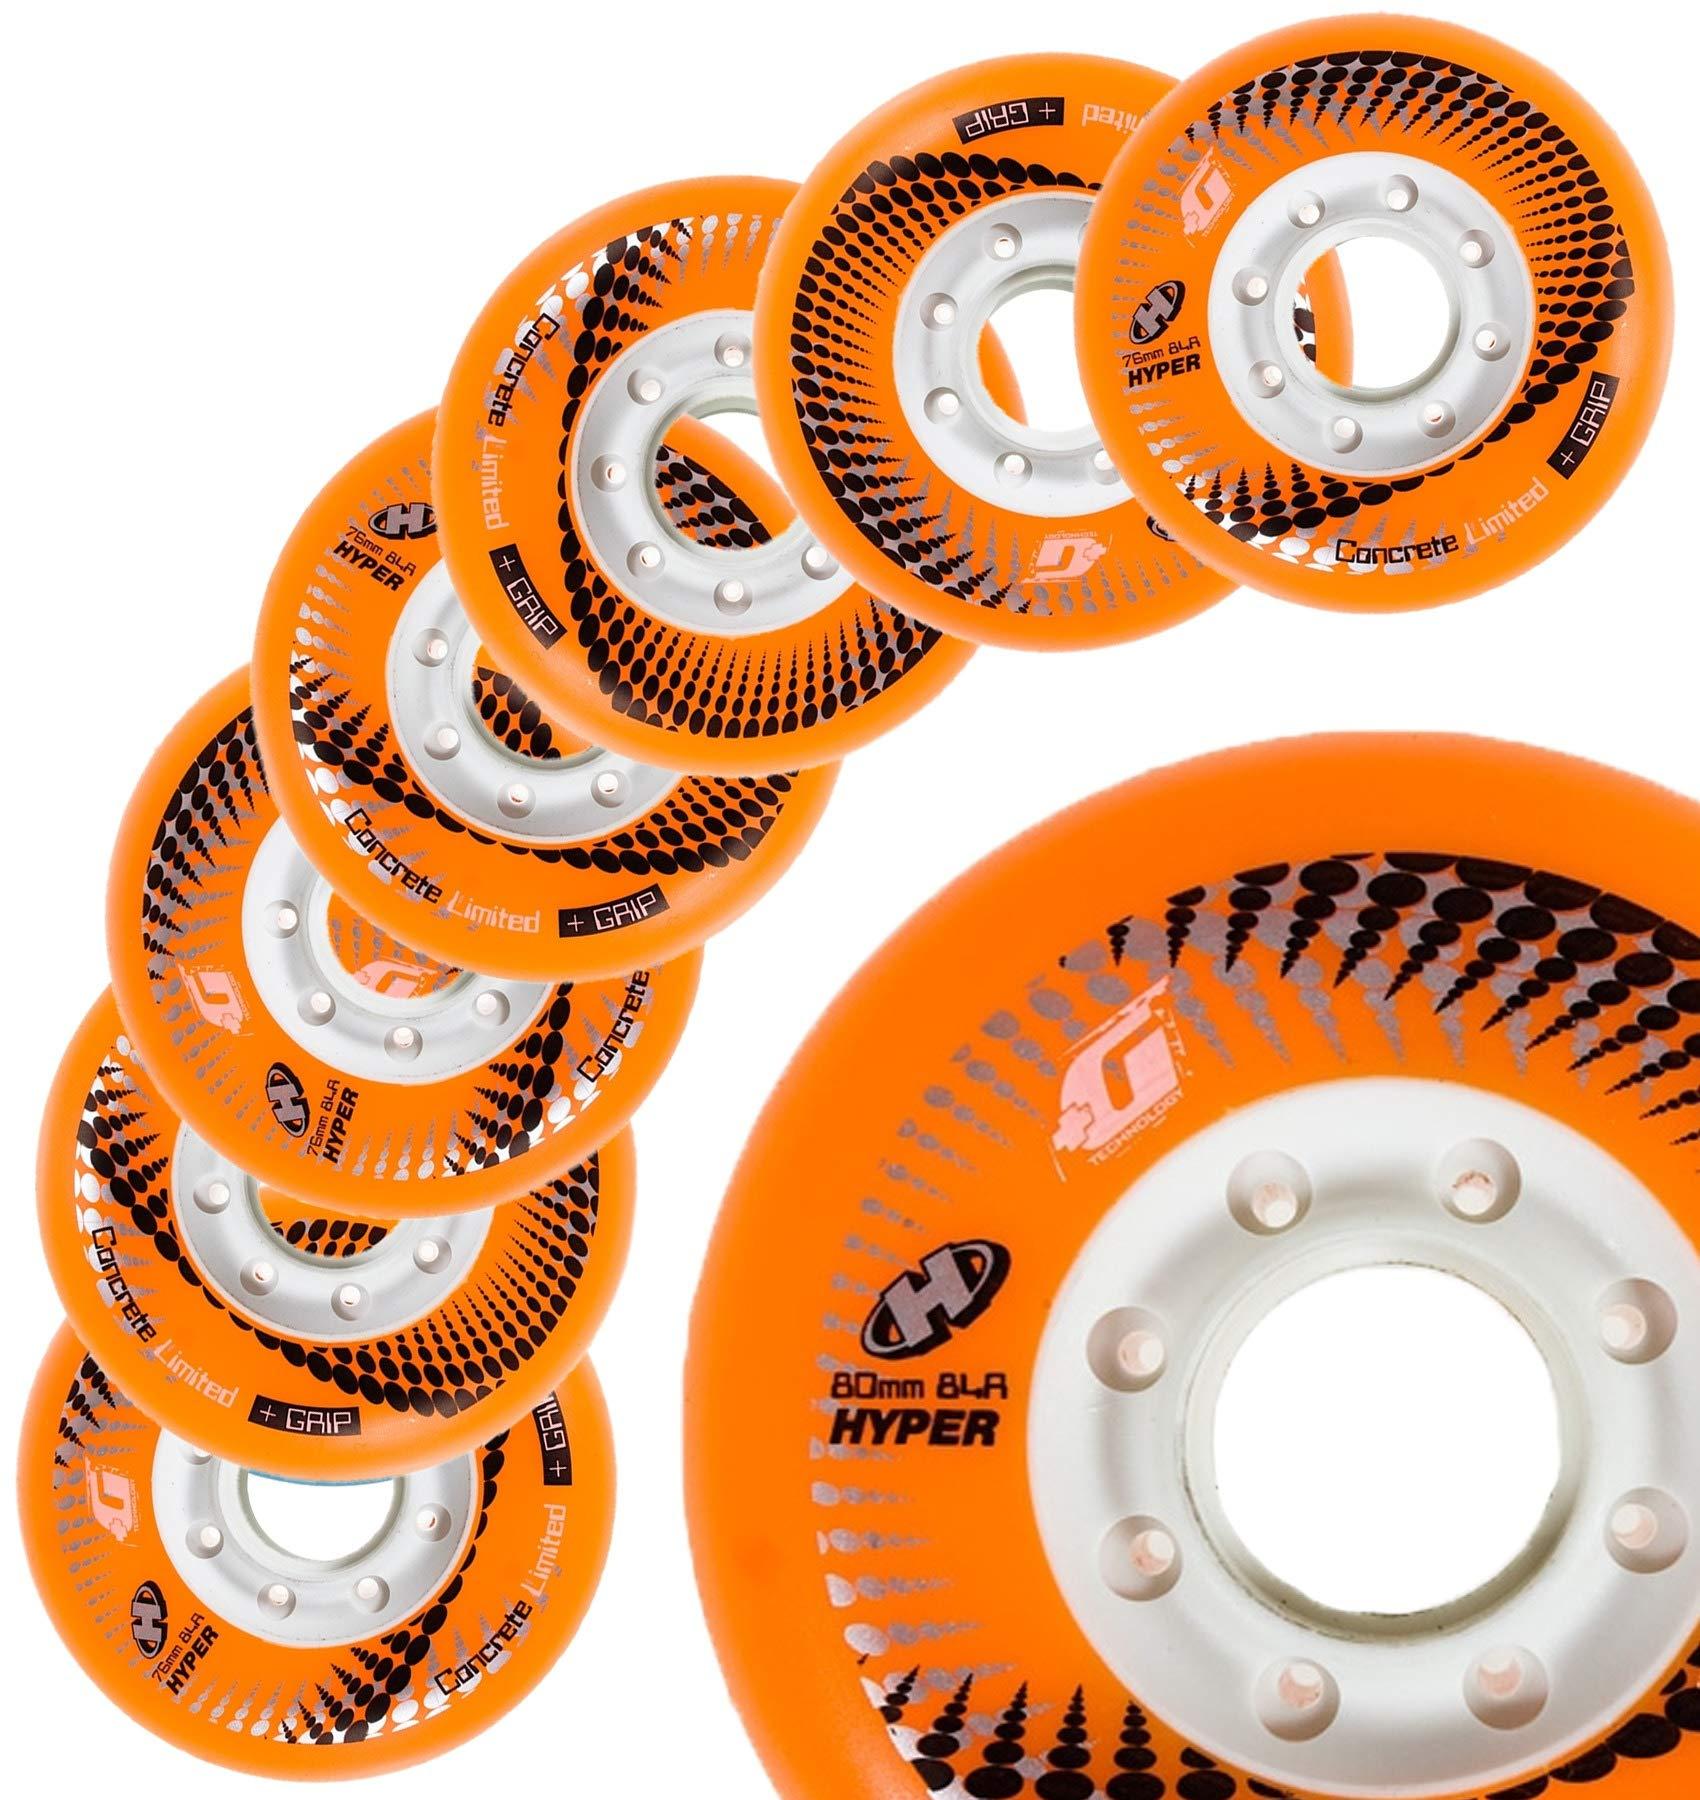 Inline Skate Wheels Hyper Concrete +G - 8 Wheels - 84A - Sizes: 72MM, 76MM, 80MM - Freeride, Slalom, Fitness, Urban - Colors: White, Black, Orange, Green, Cyan, Red (Orange, 76MM)